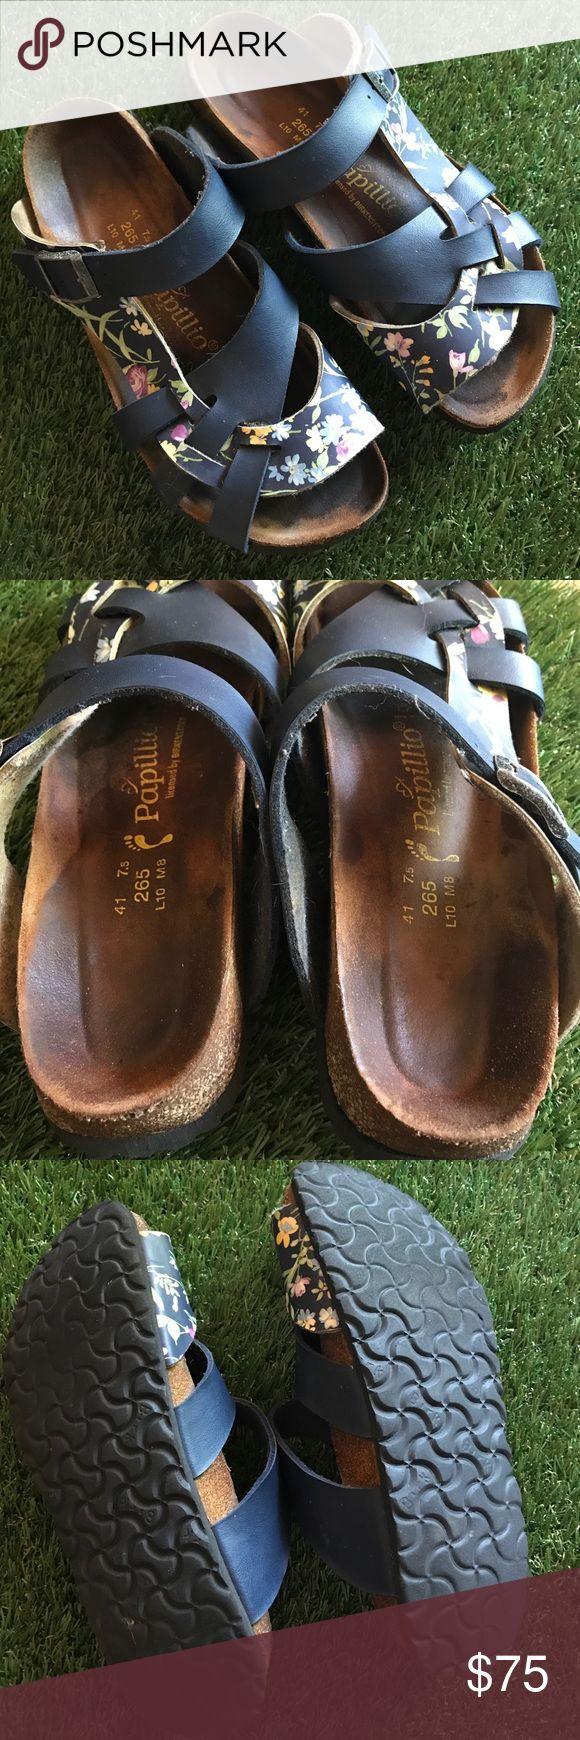 Papillio by Birkenstock sandals Navy blue/floral sandals made by Birkenstock. Size 41 (ladies 10) excellent used condition Birkenstock Shoes Sandals